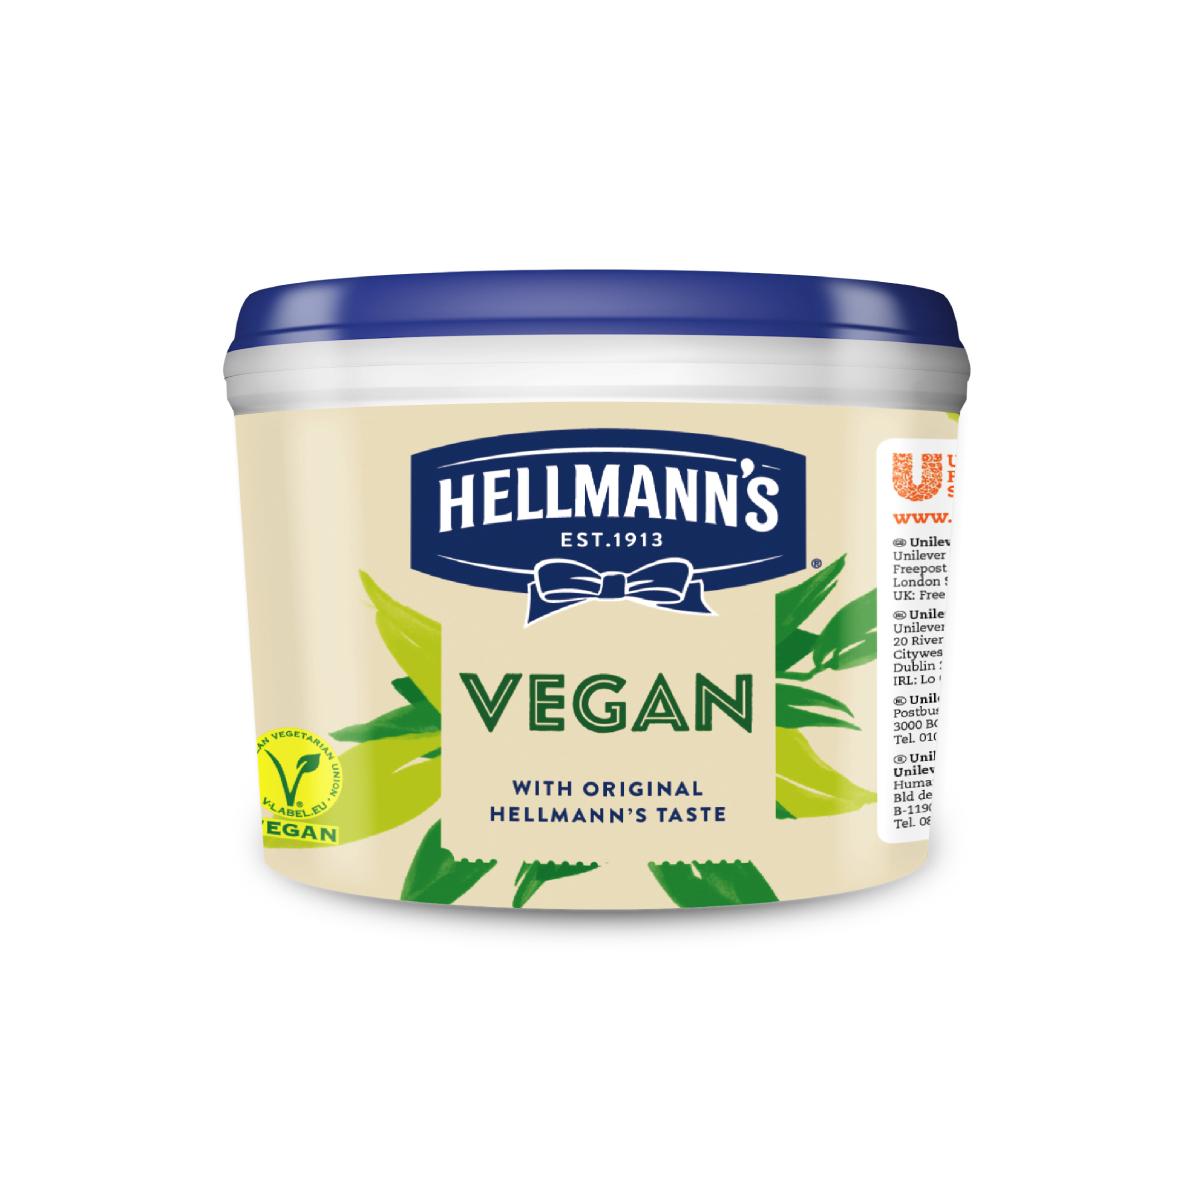 Hellmann's Веган майонеза 2.5 kg - Hellmann's майонеза във веган вариант с характерния вкус и качество на Hellmann's